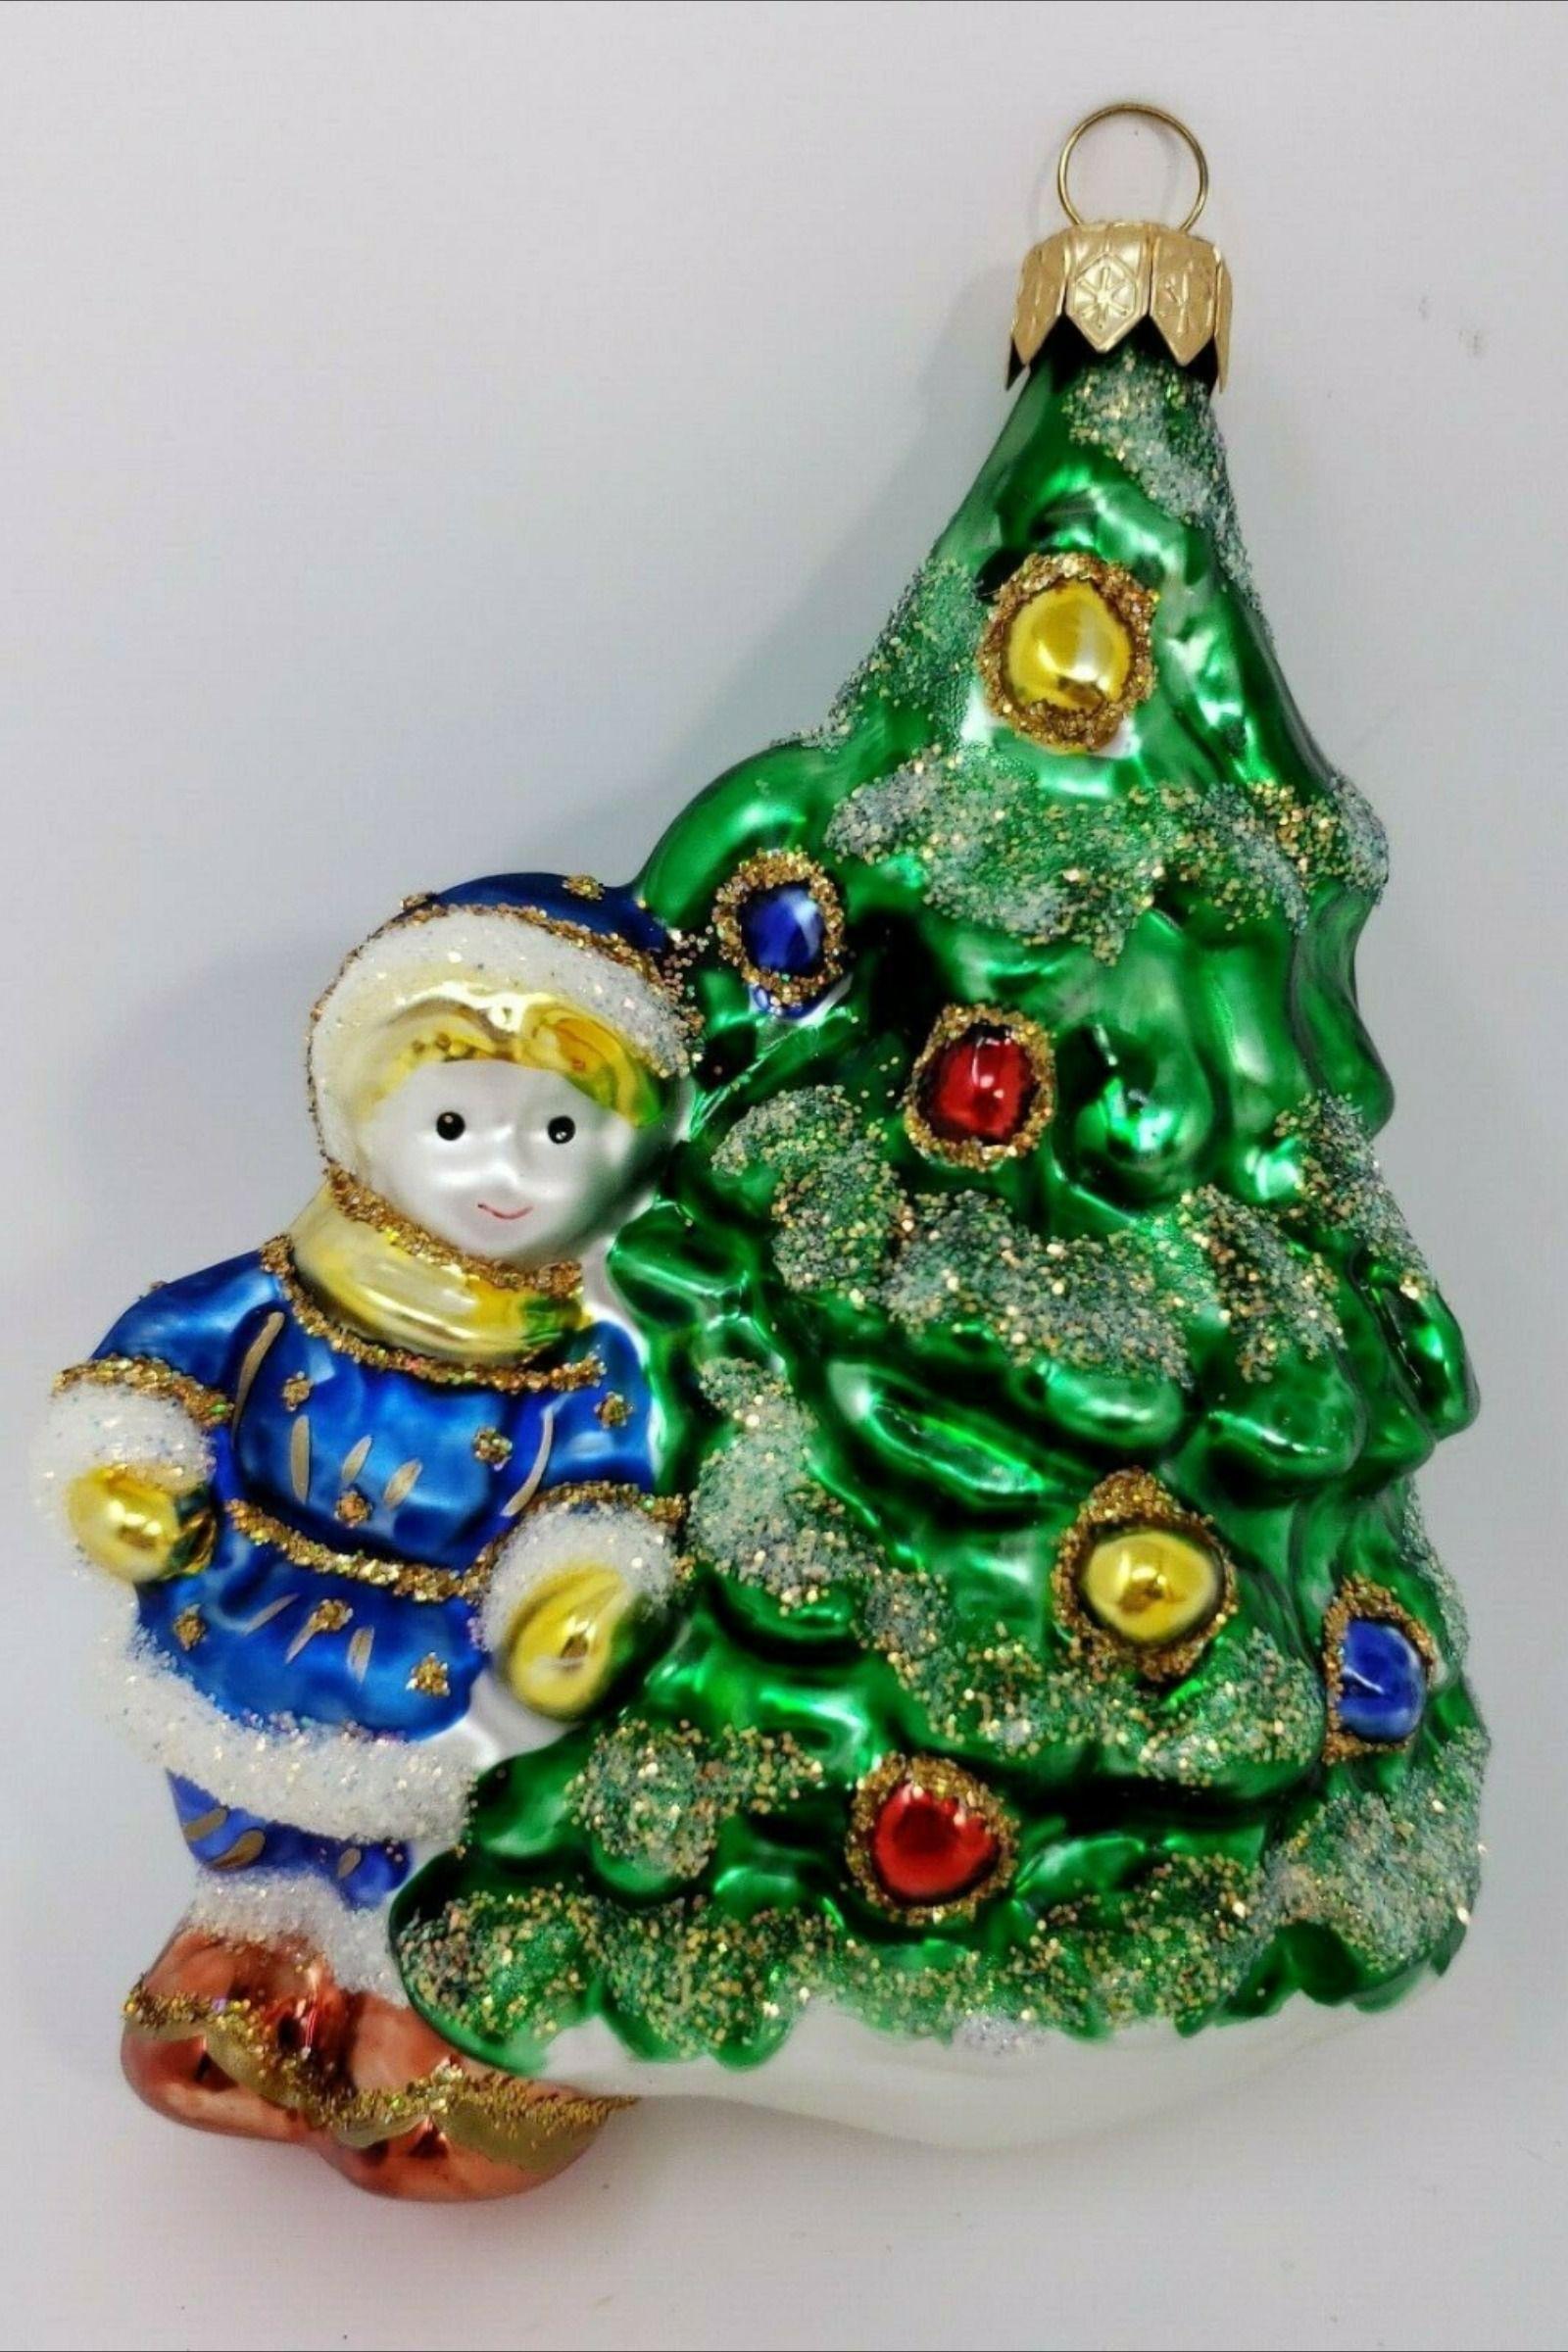 5 Vintage Holiday Blown Glass Christmas Tree Ornament Glass Christmas Tree Glass Christmas Tree Ornaments Christmas Tree Ornaments